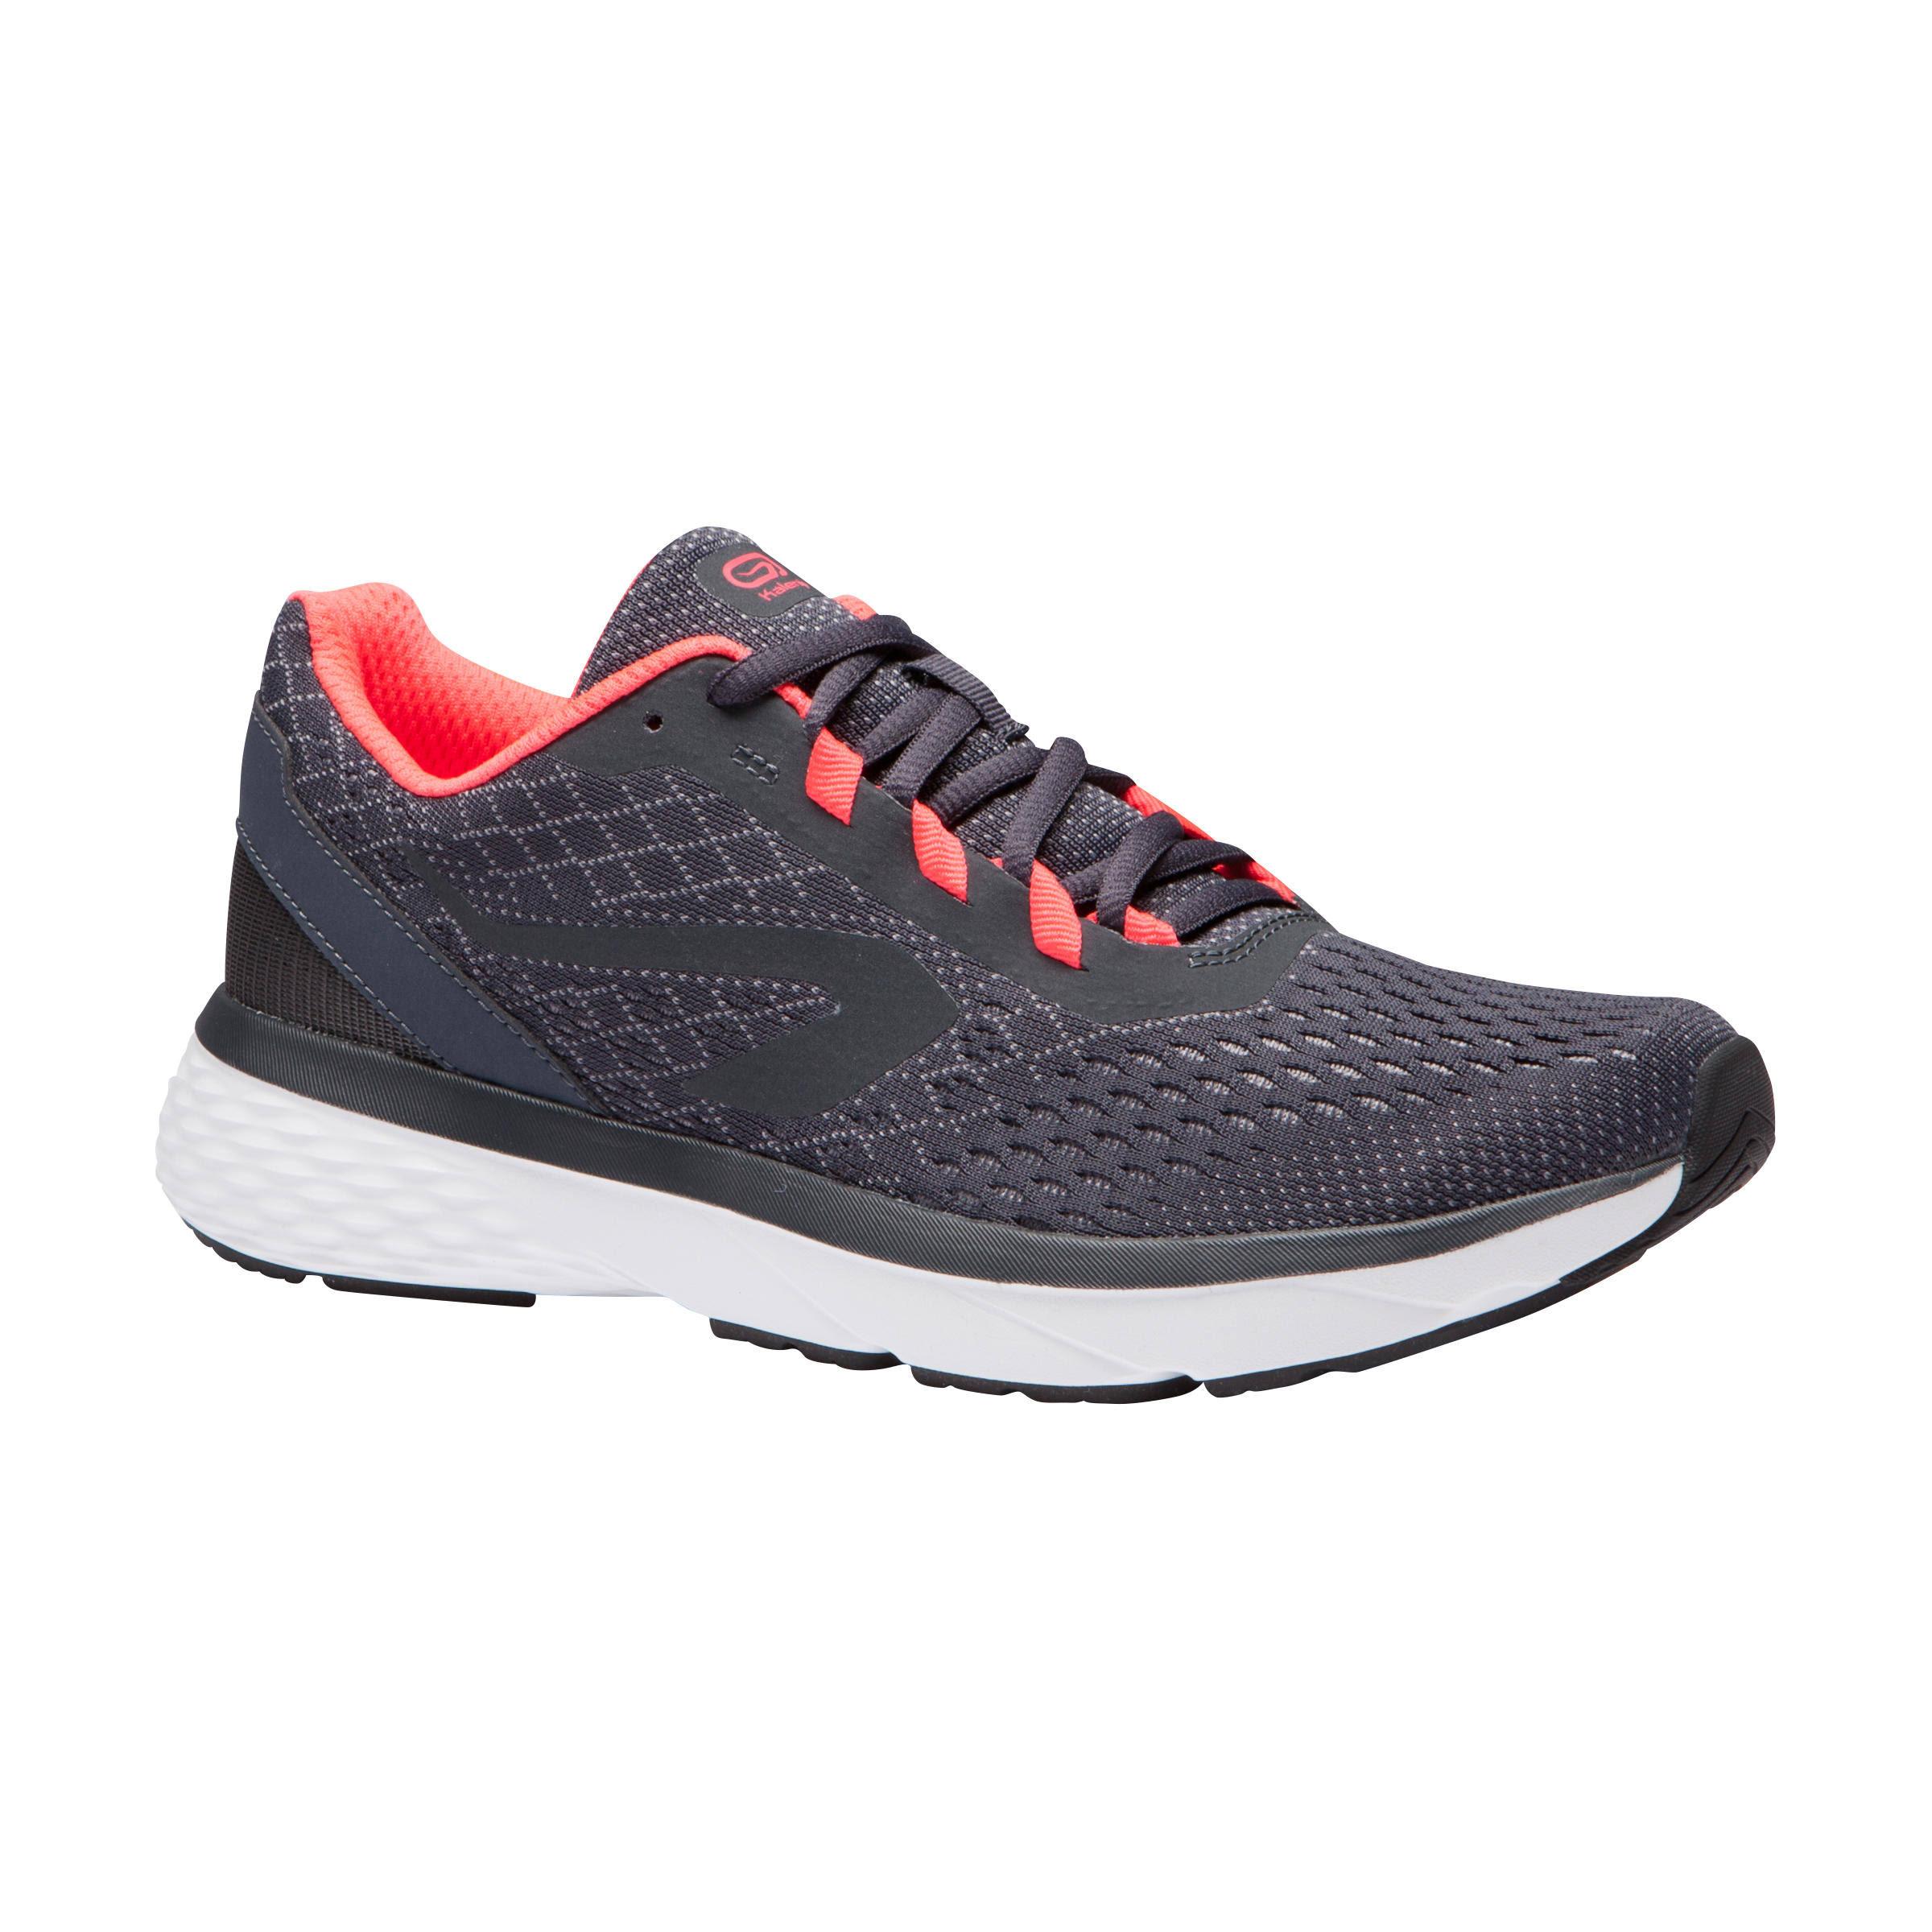 Kalenji Run Support Women's Running Shoes Grey Coral